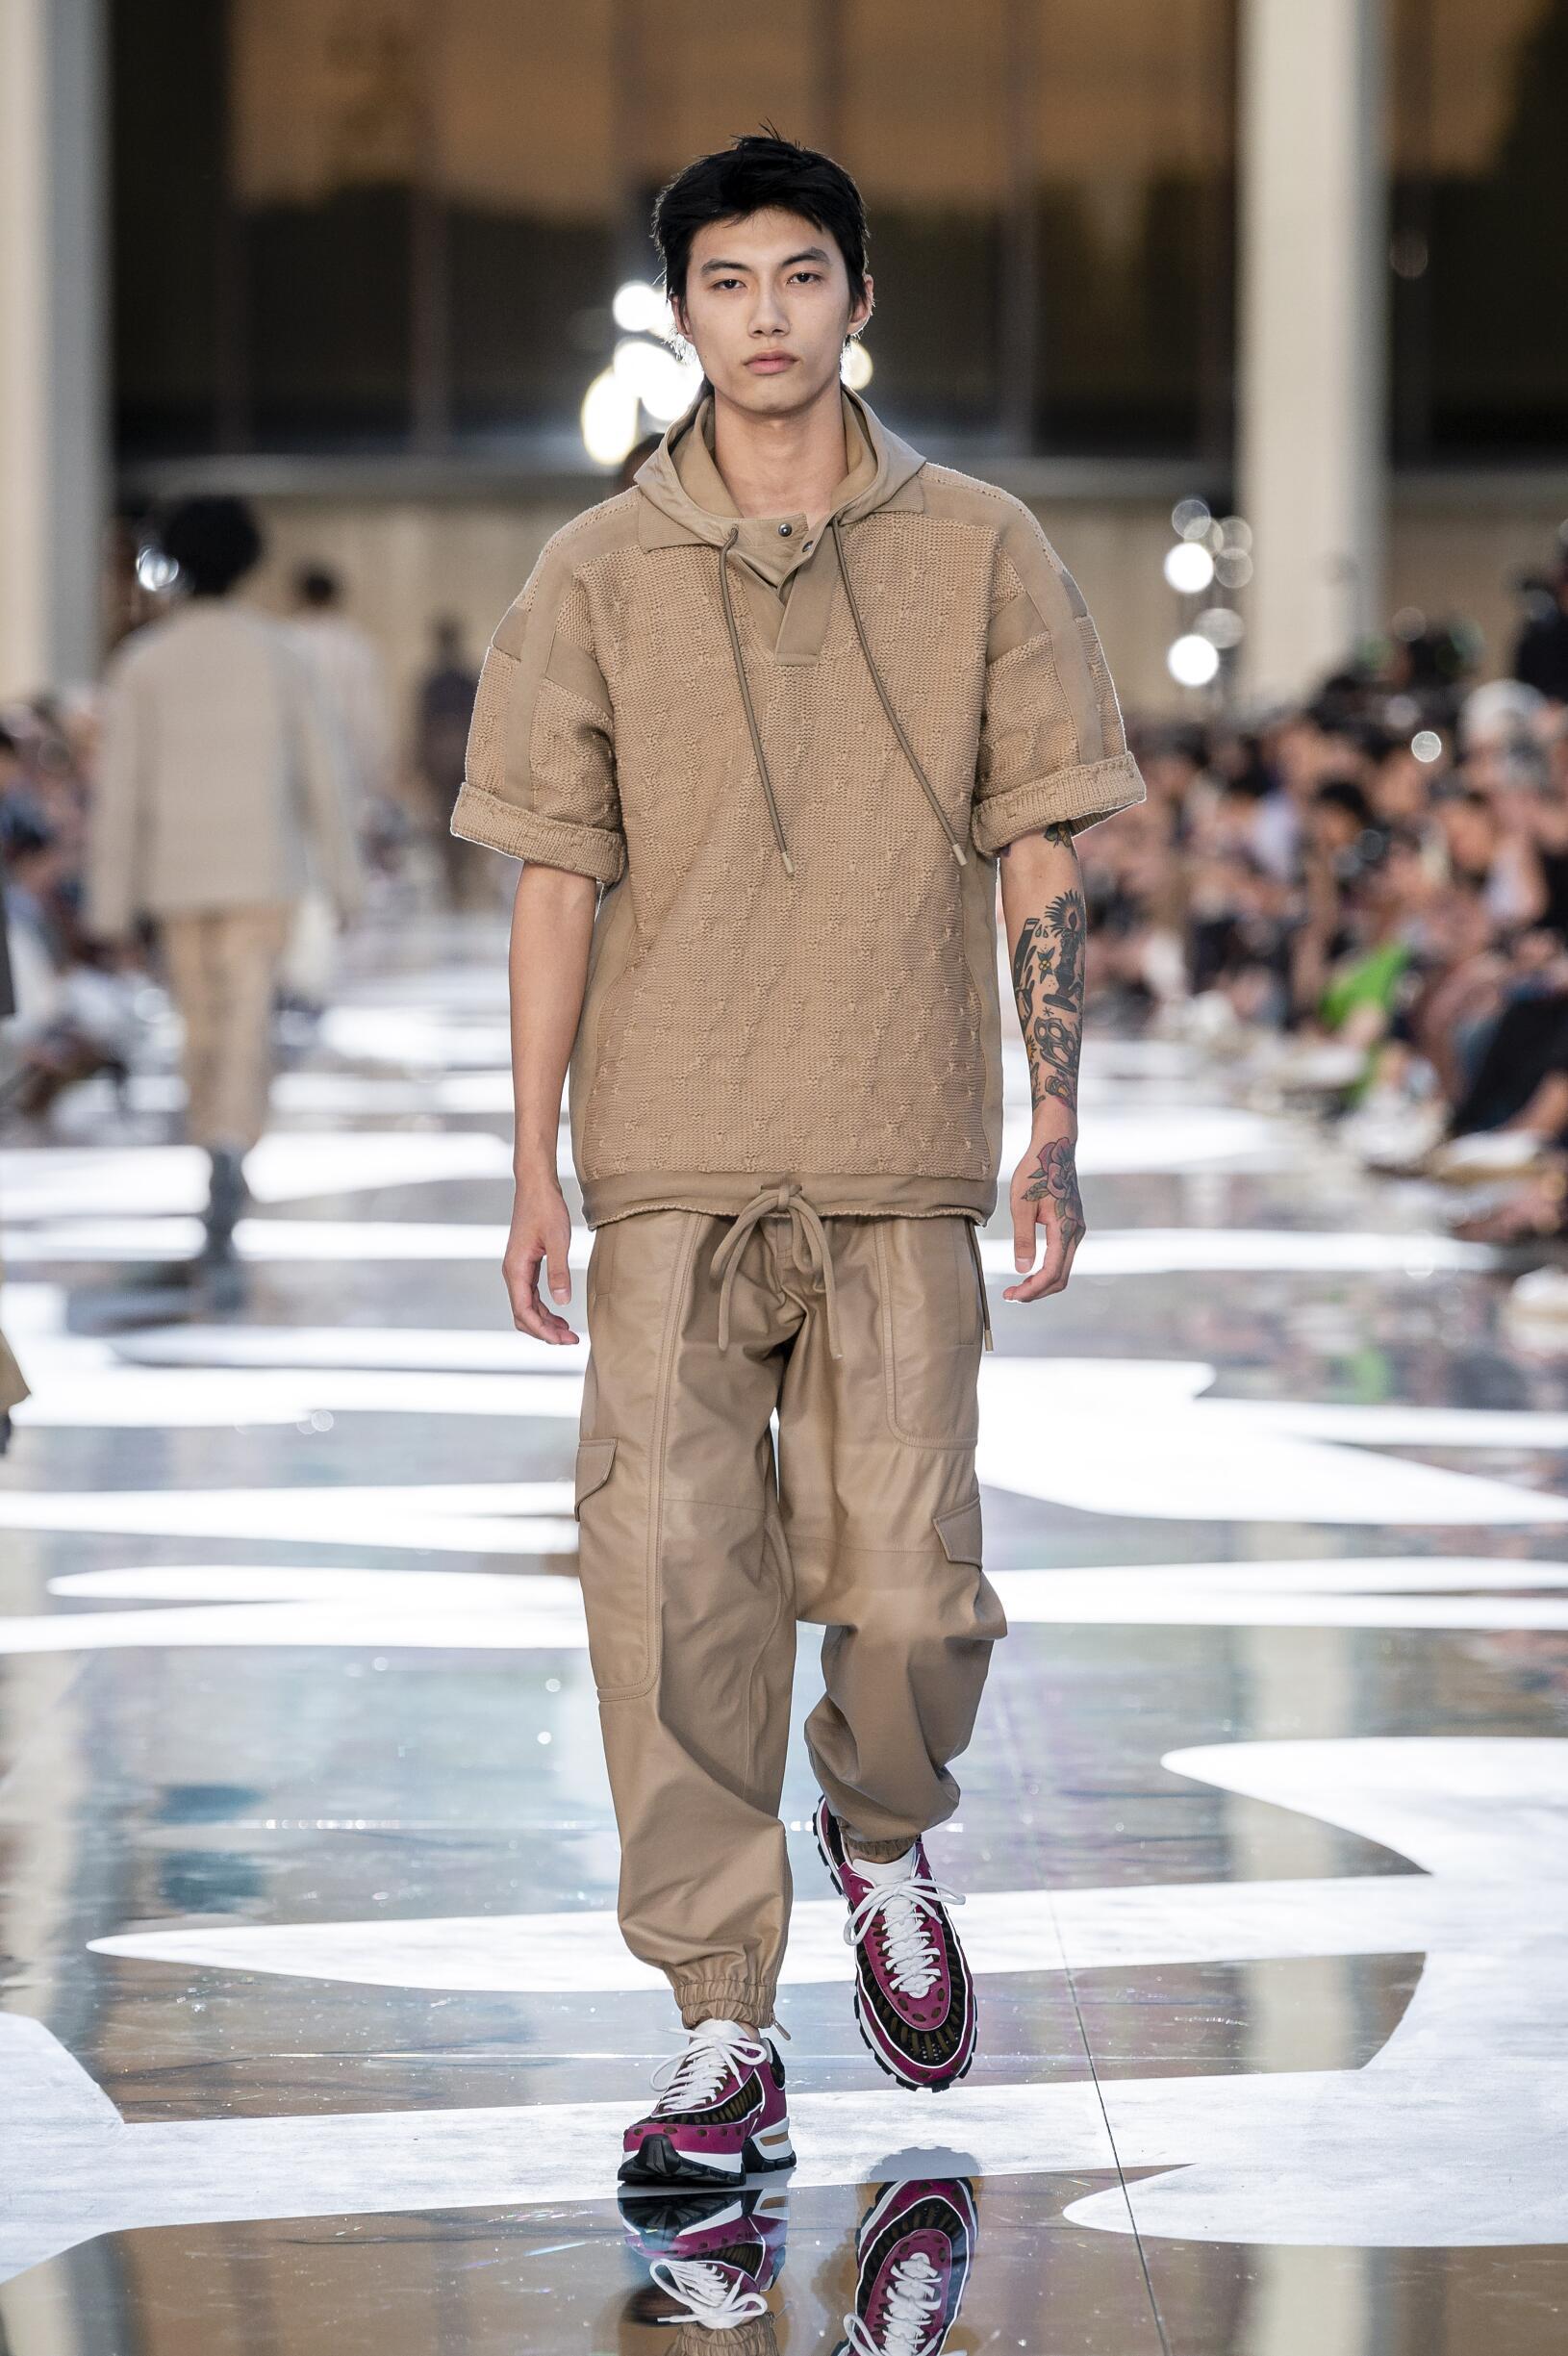 Ermenegildo Zegna Couture Men's Collection 2019